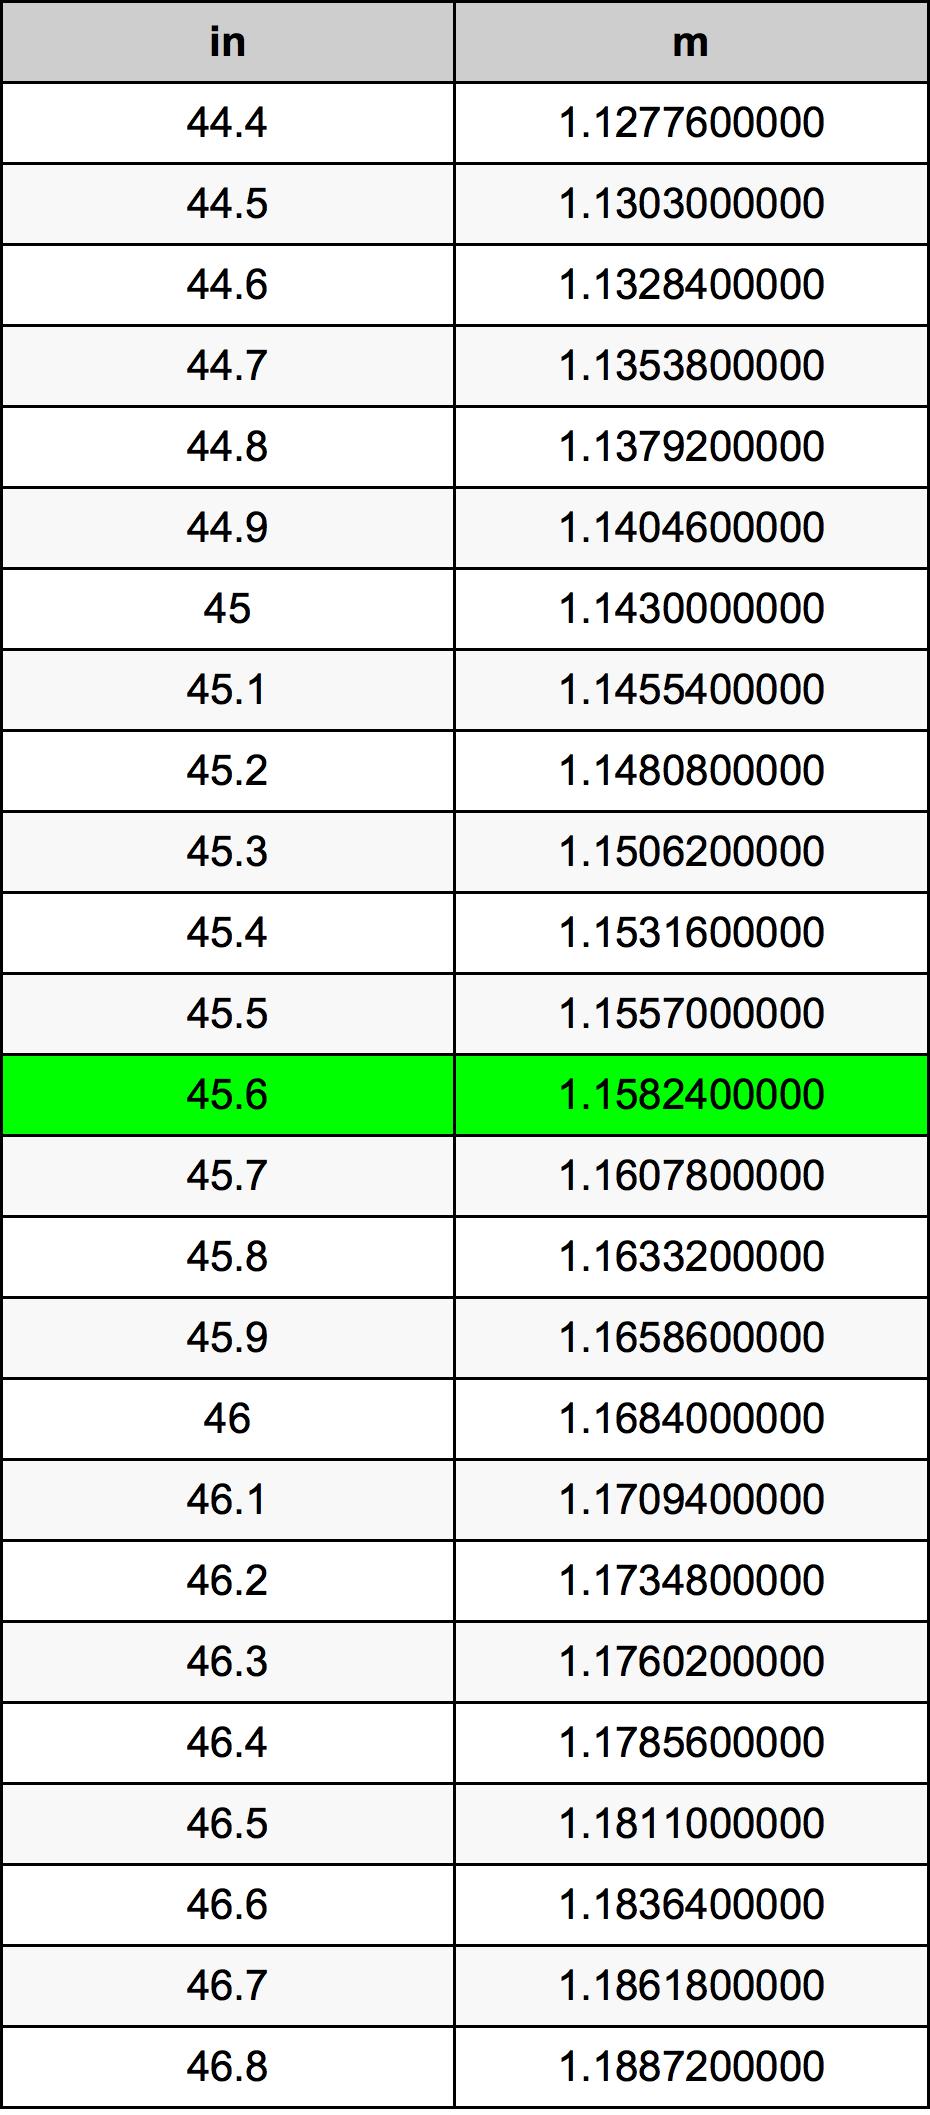 45.6 дюйм Таблица преобразования